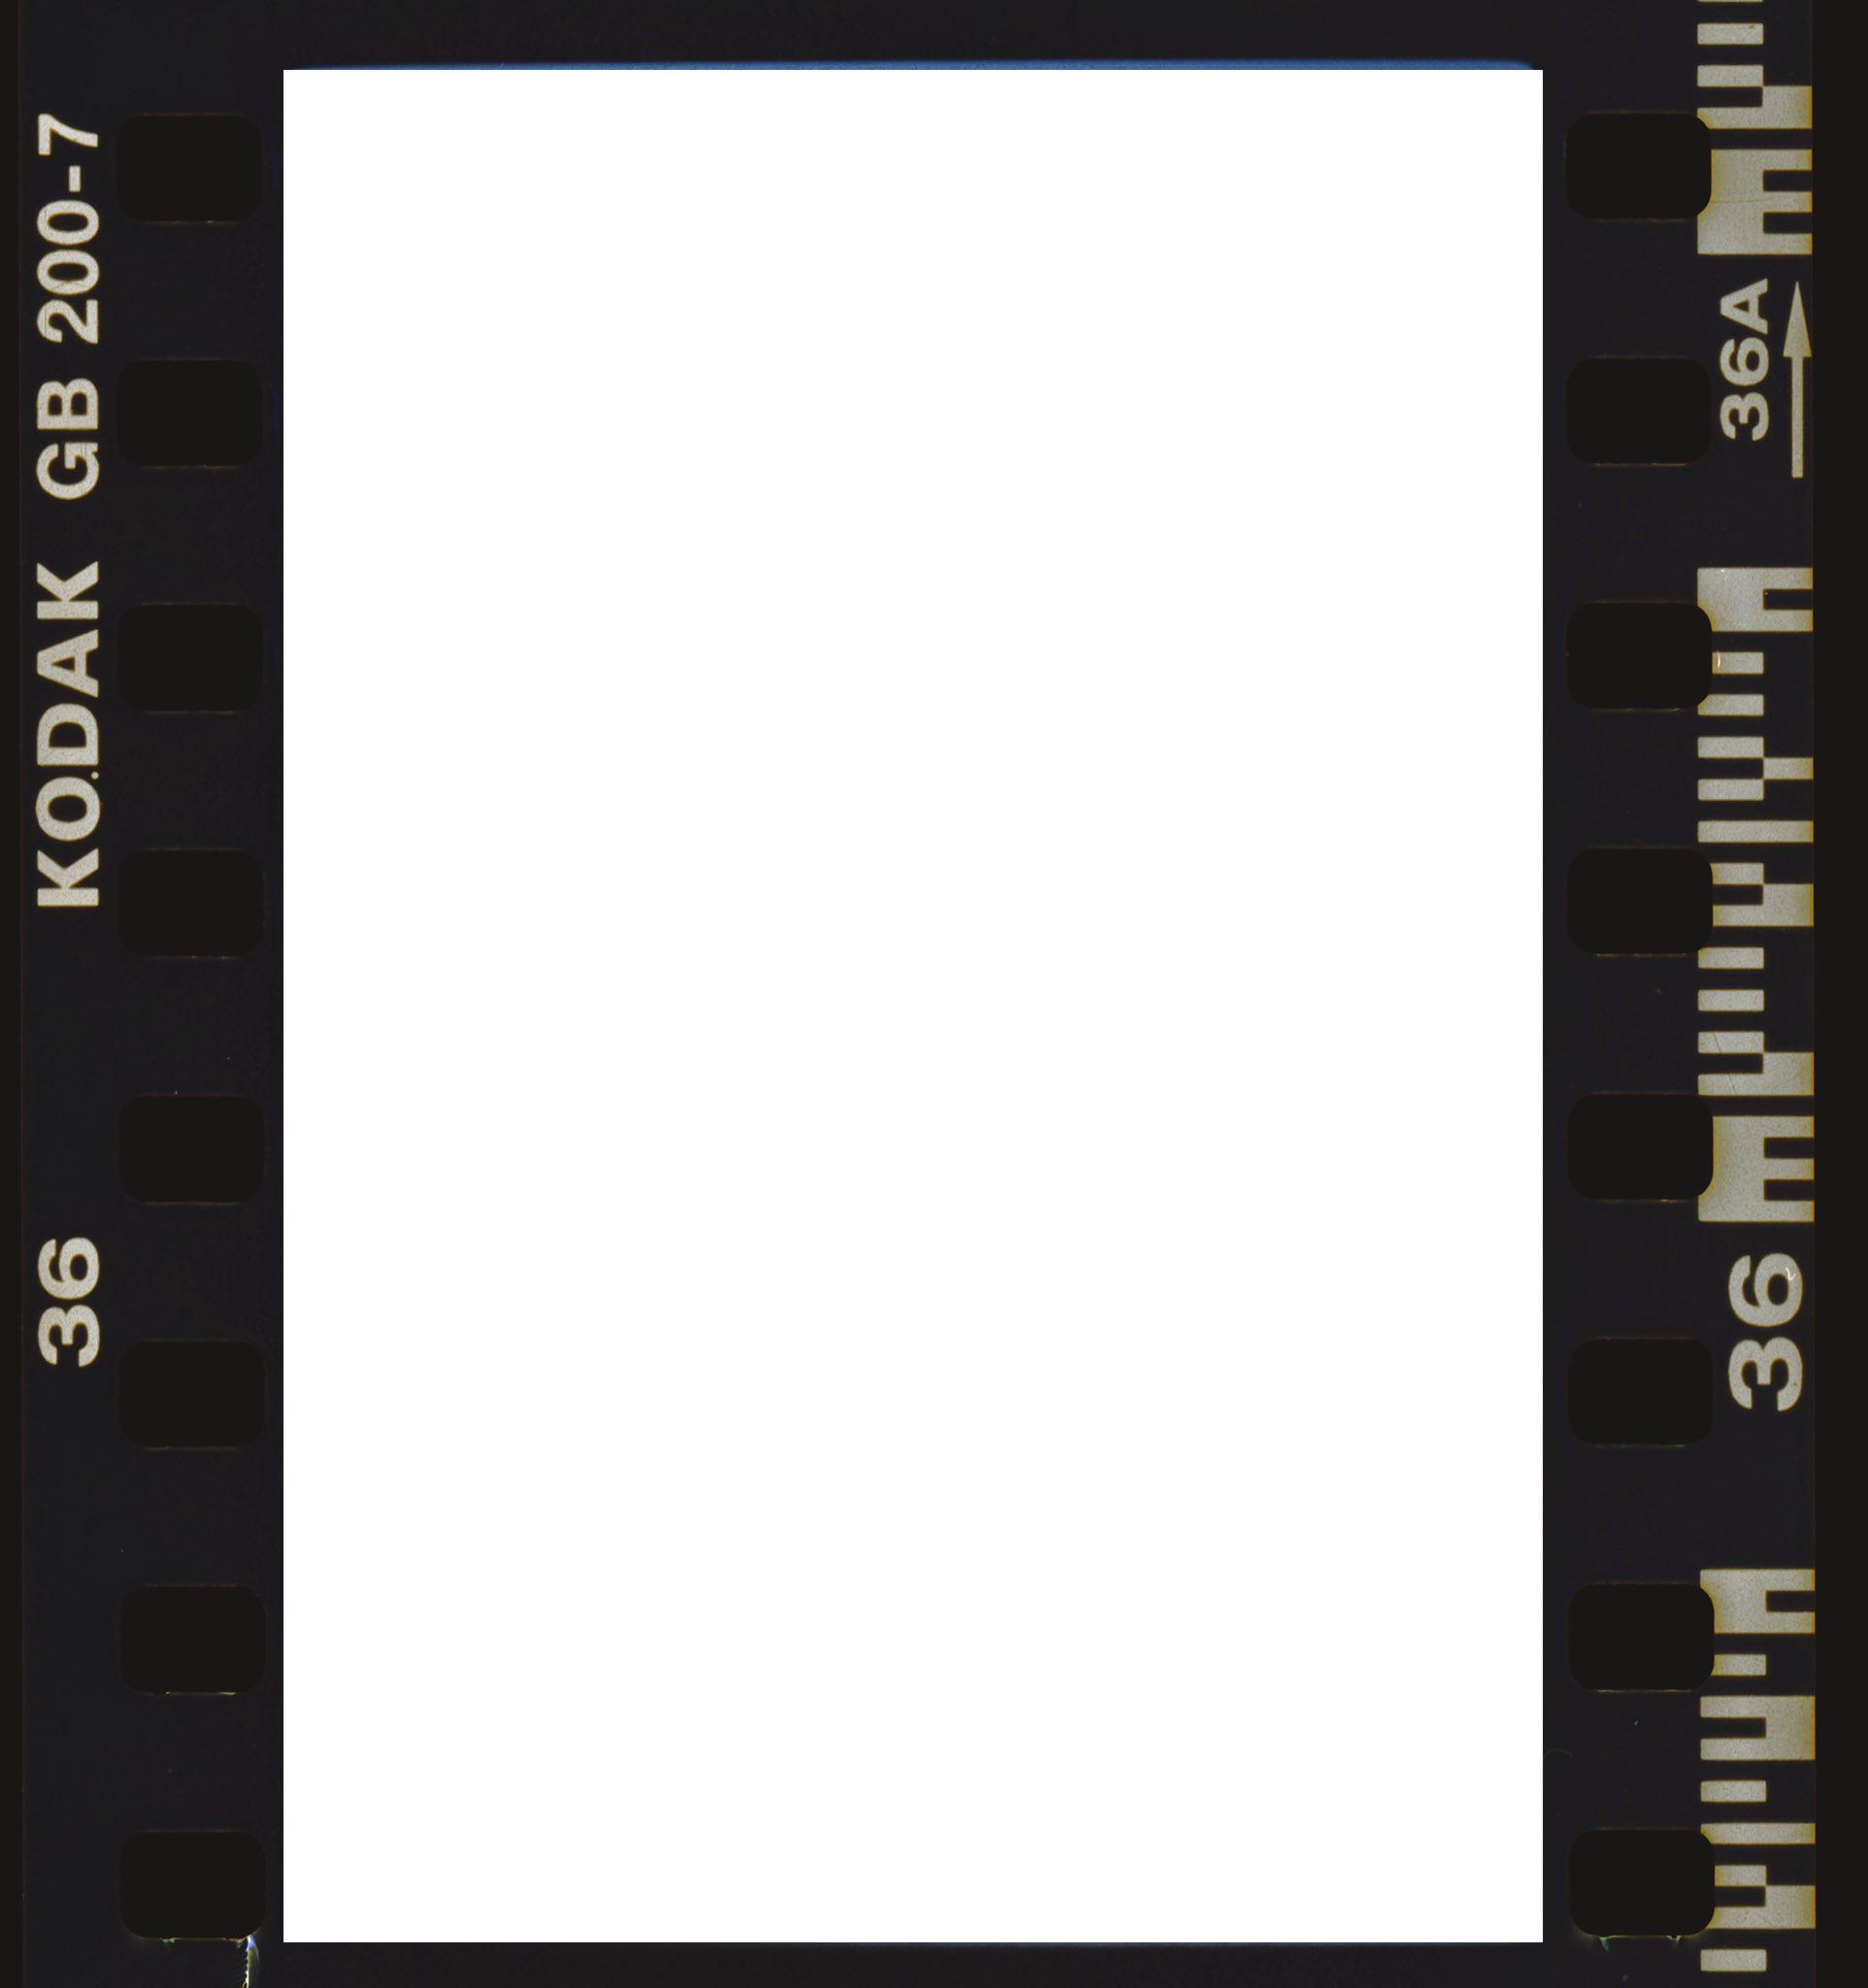 Kodak Film Frame Fotografi Pemula Fotografi Bingkai Foto